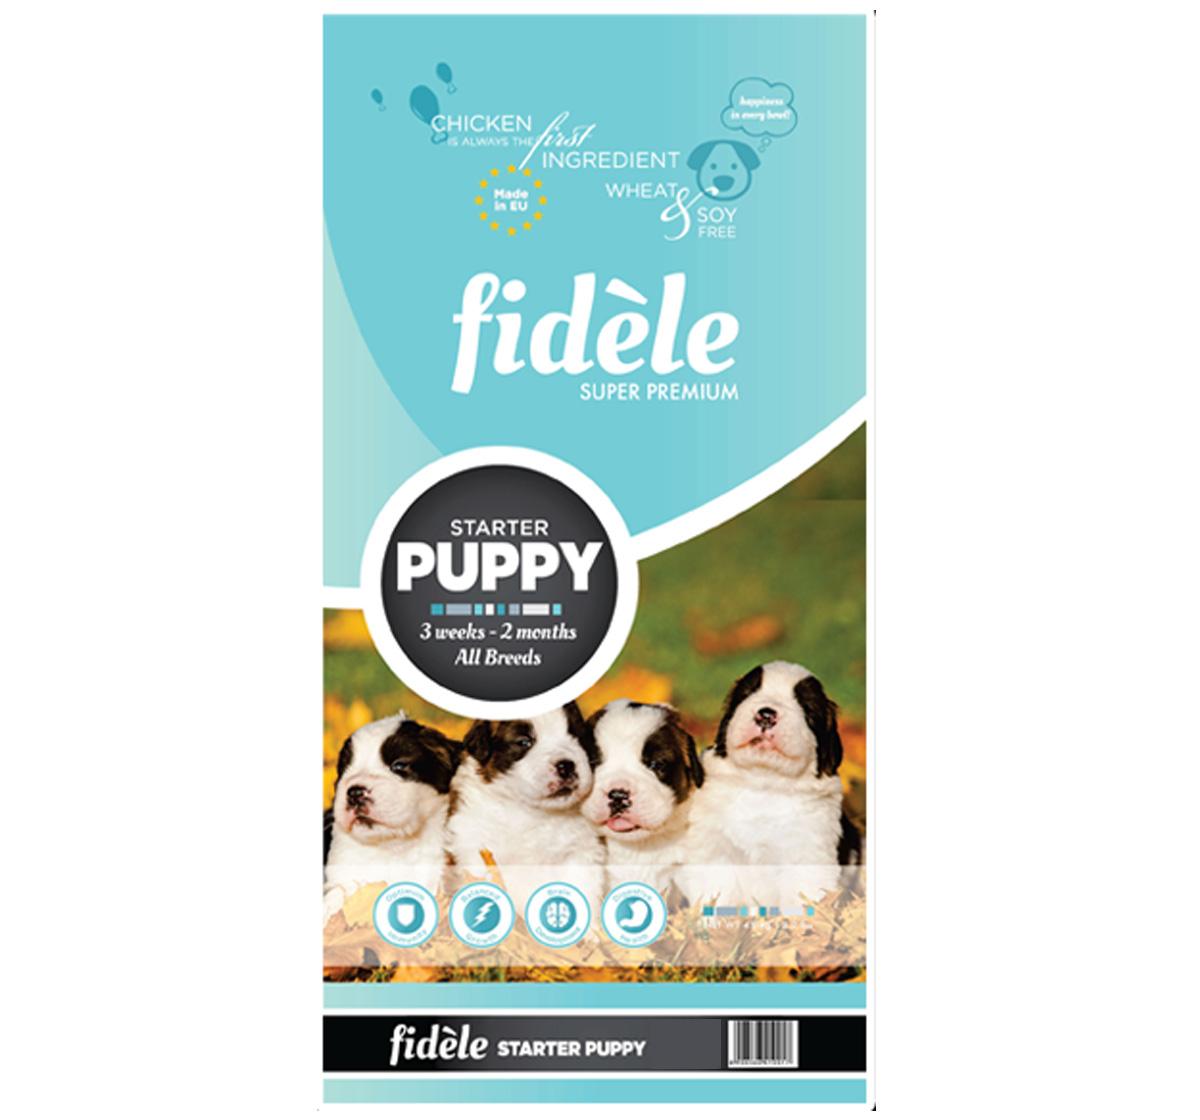 Fidele Dog Food